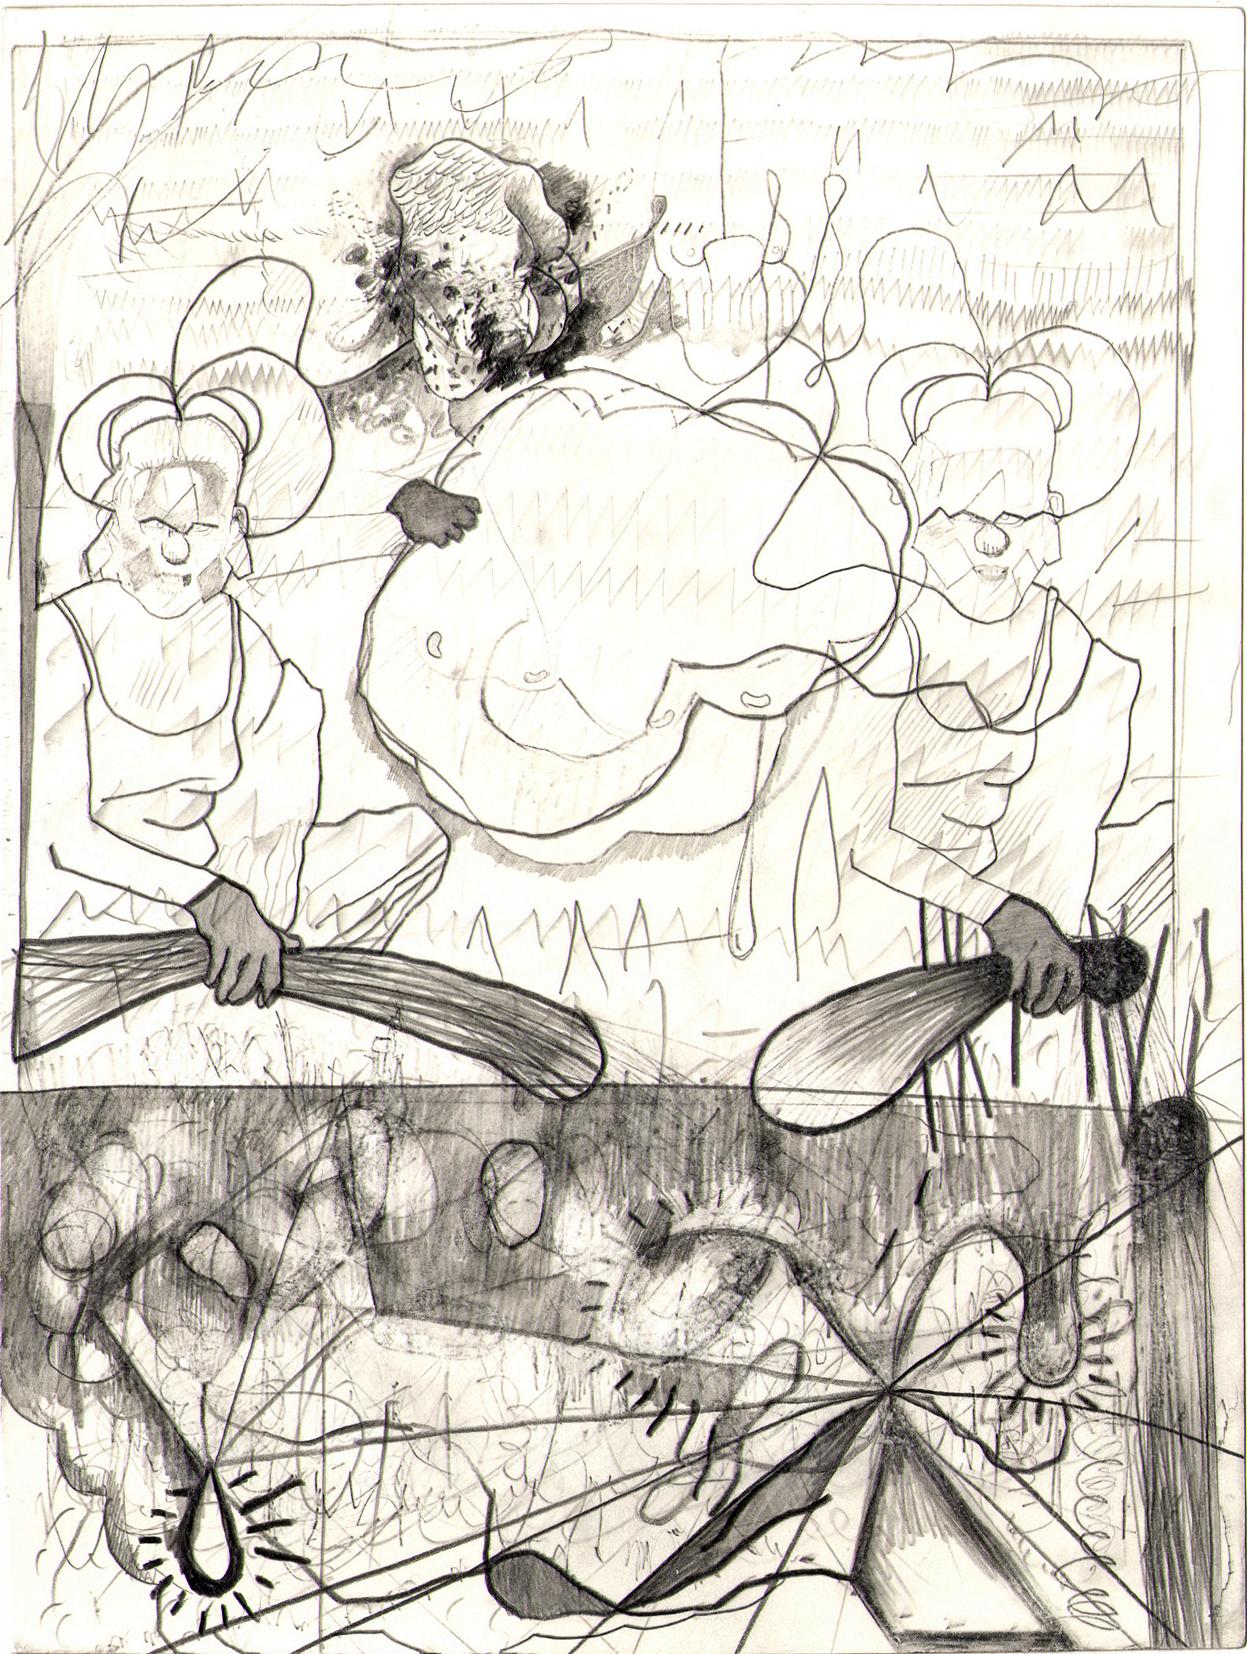 O.T. ( kinder u konder o ), 2005  Bleistift auf Papier, 26.5x35cm